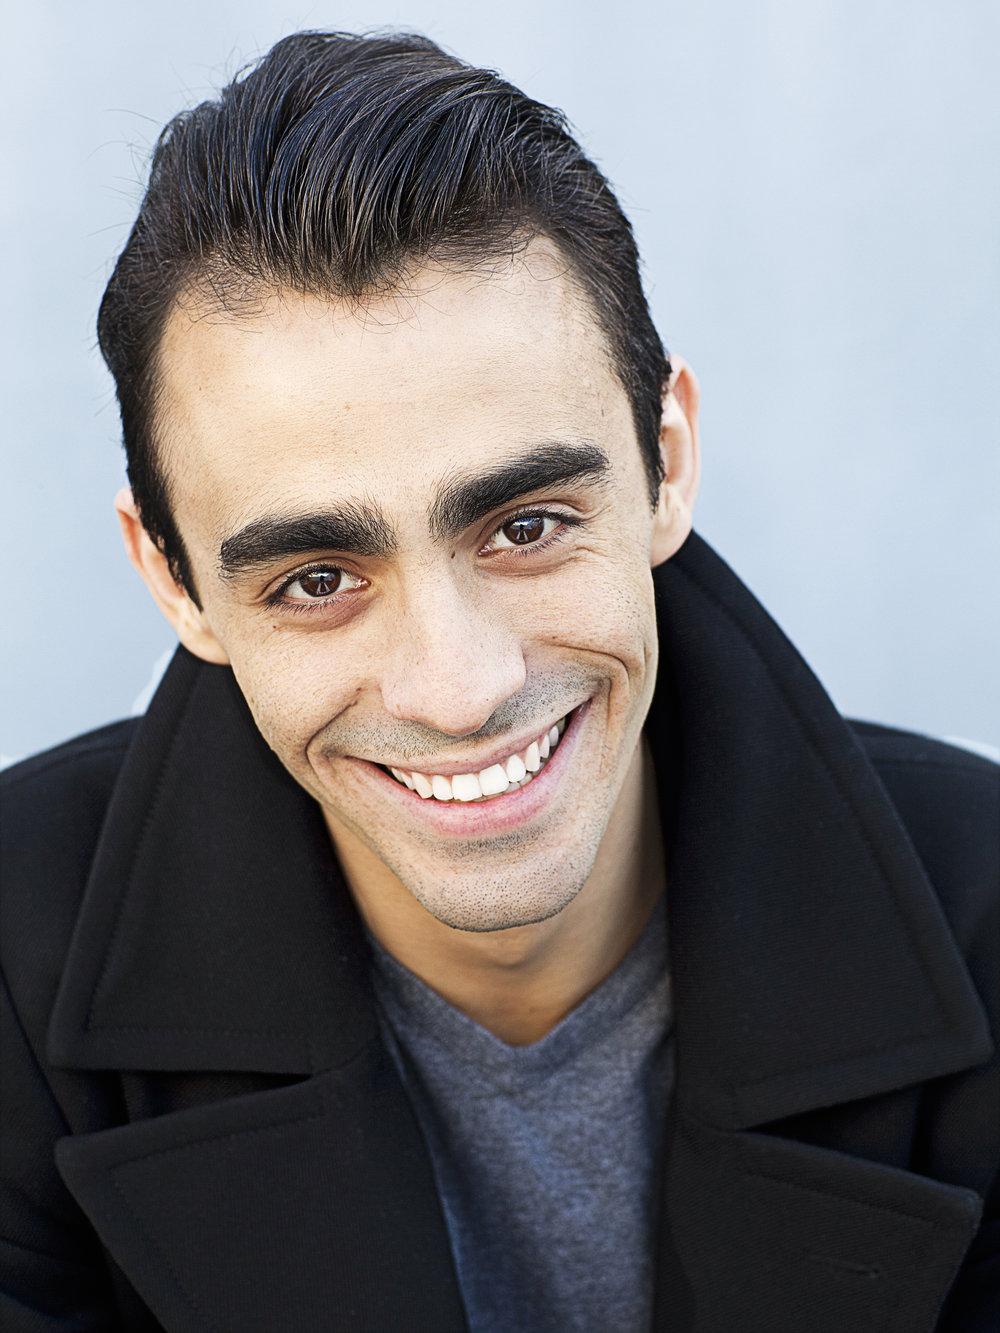 Lucas Rivera-Casanova